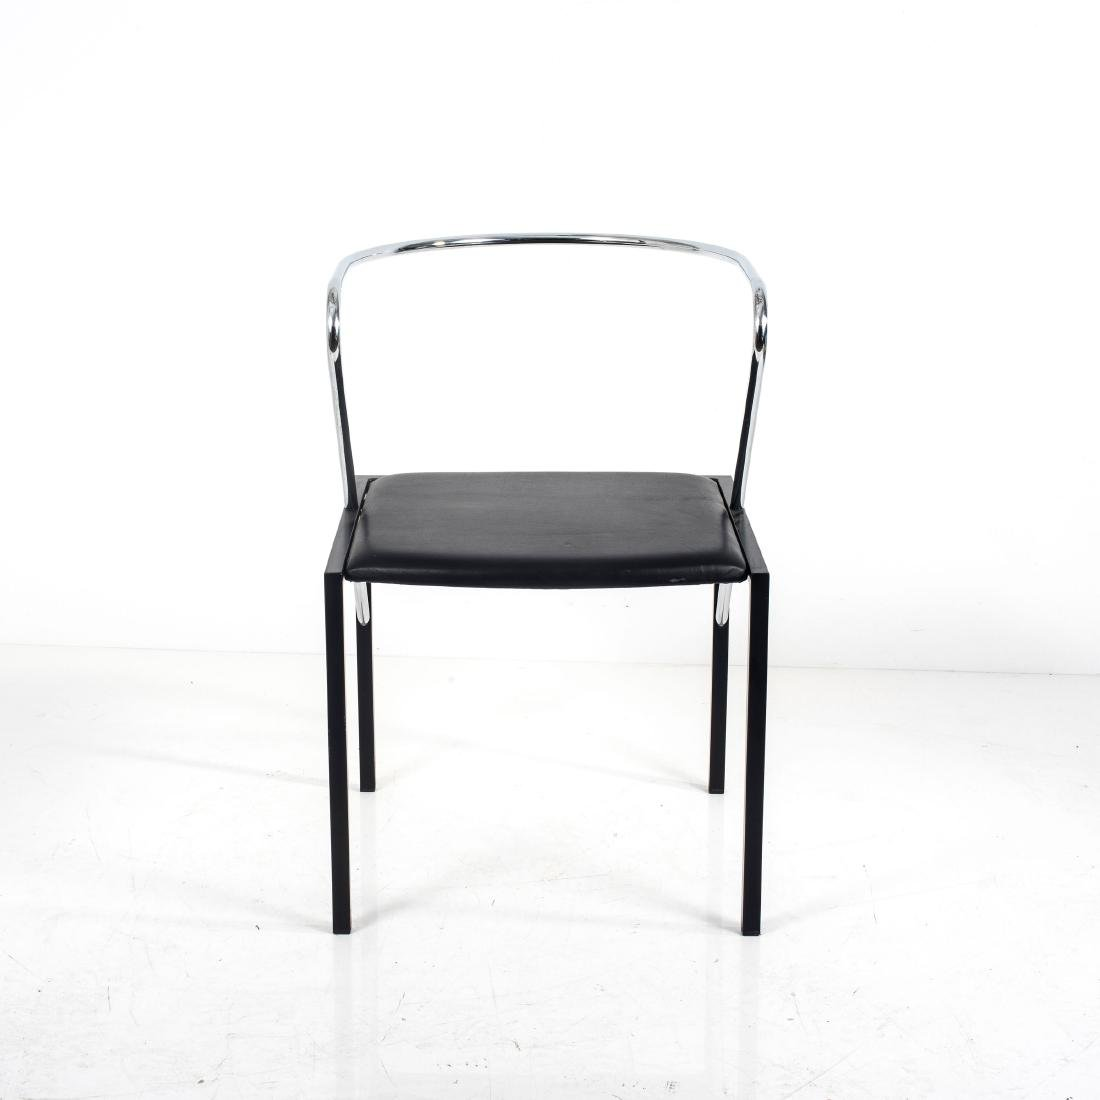 'Apple Honey chair', 1985 - 2